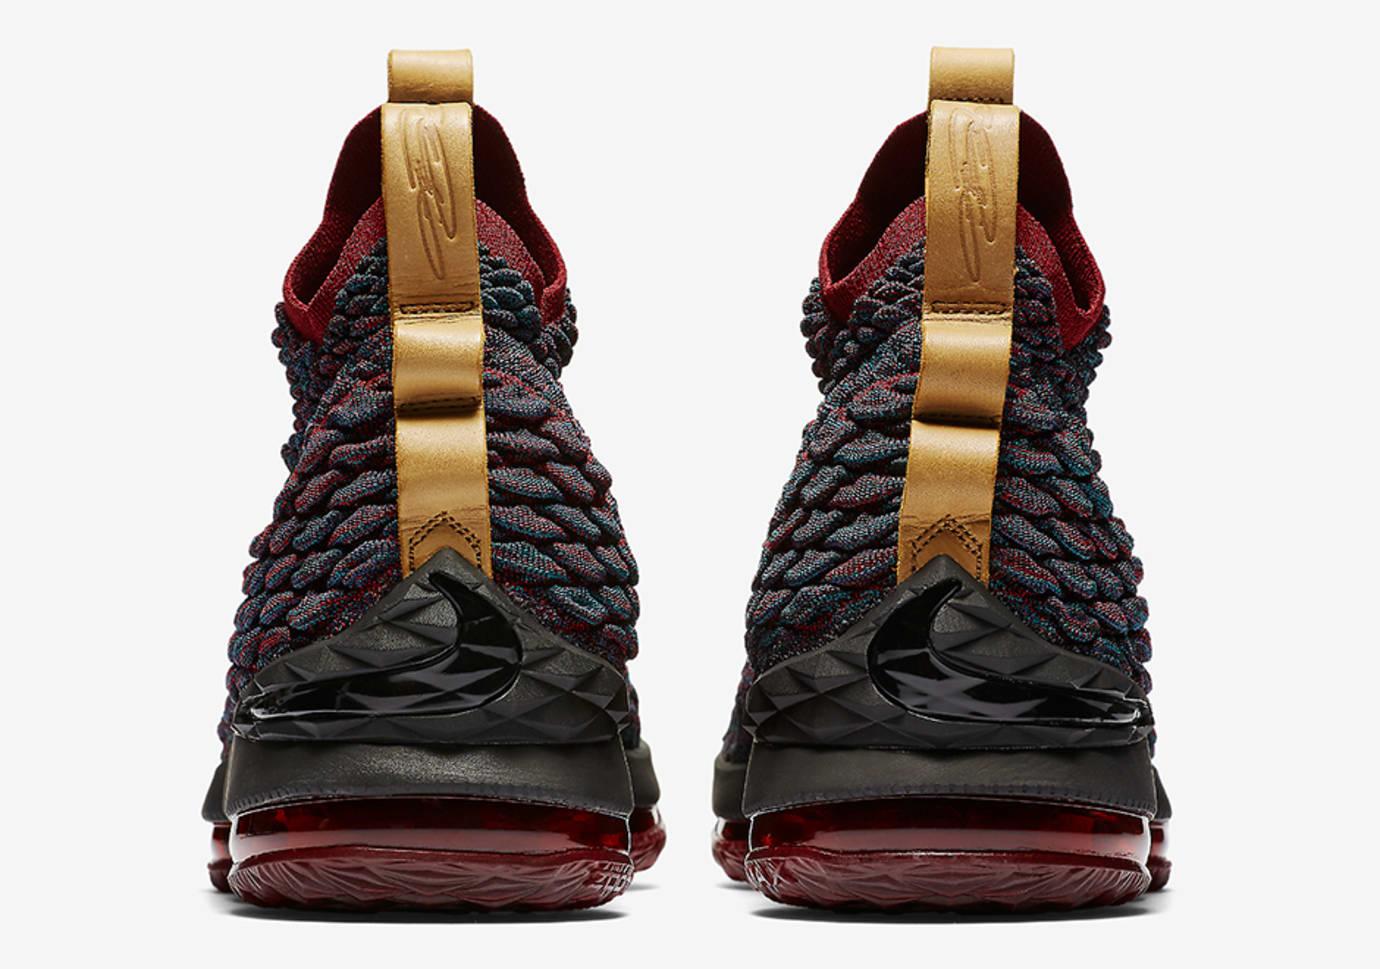 435bf55a384 Image via Nike Nike LeBron 15  New Heights  897648-300 (Heel)